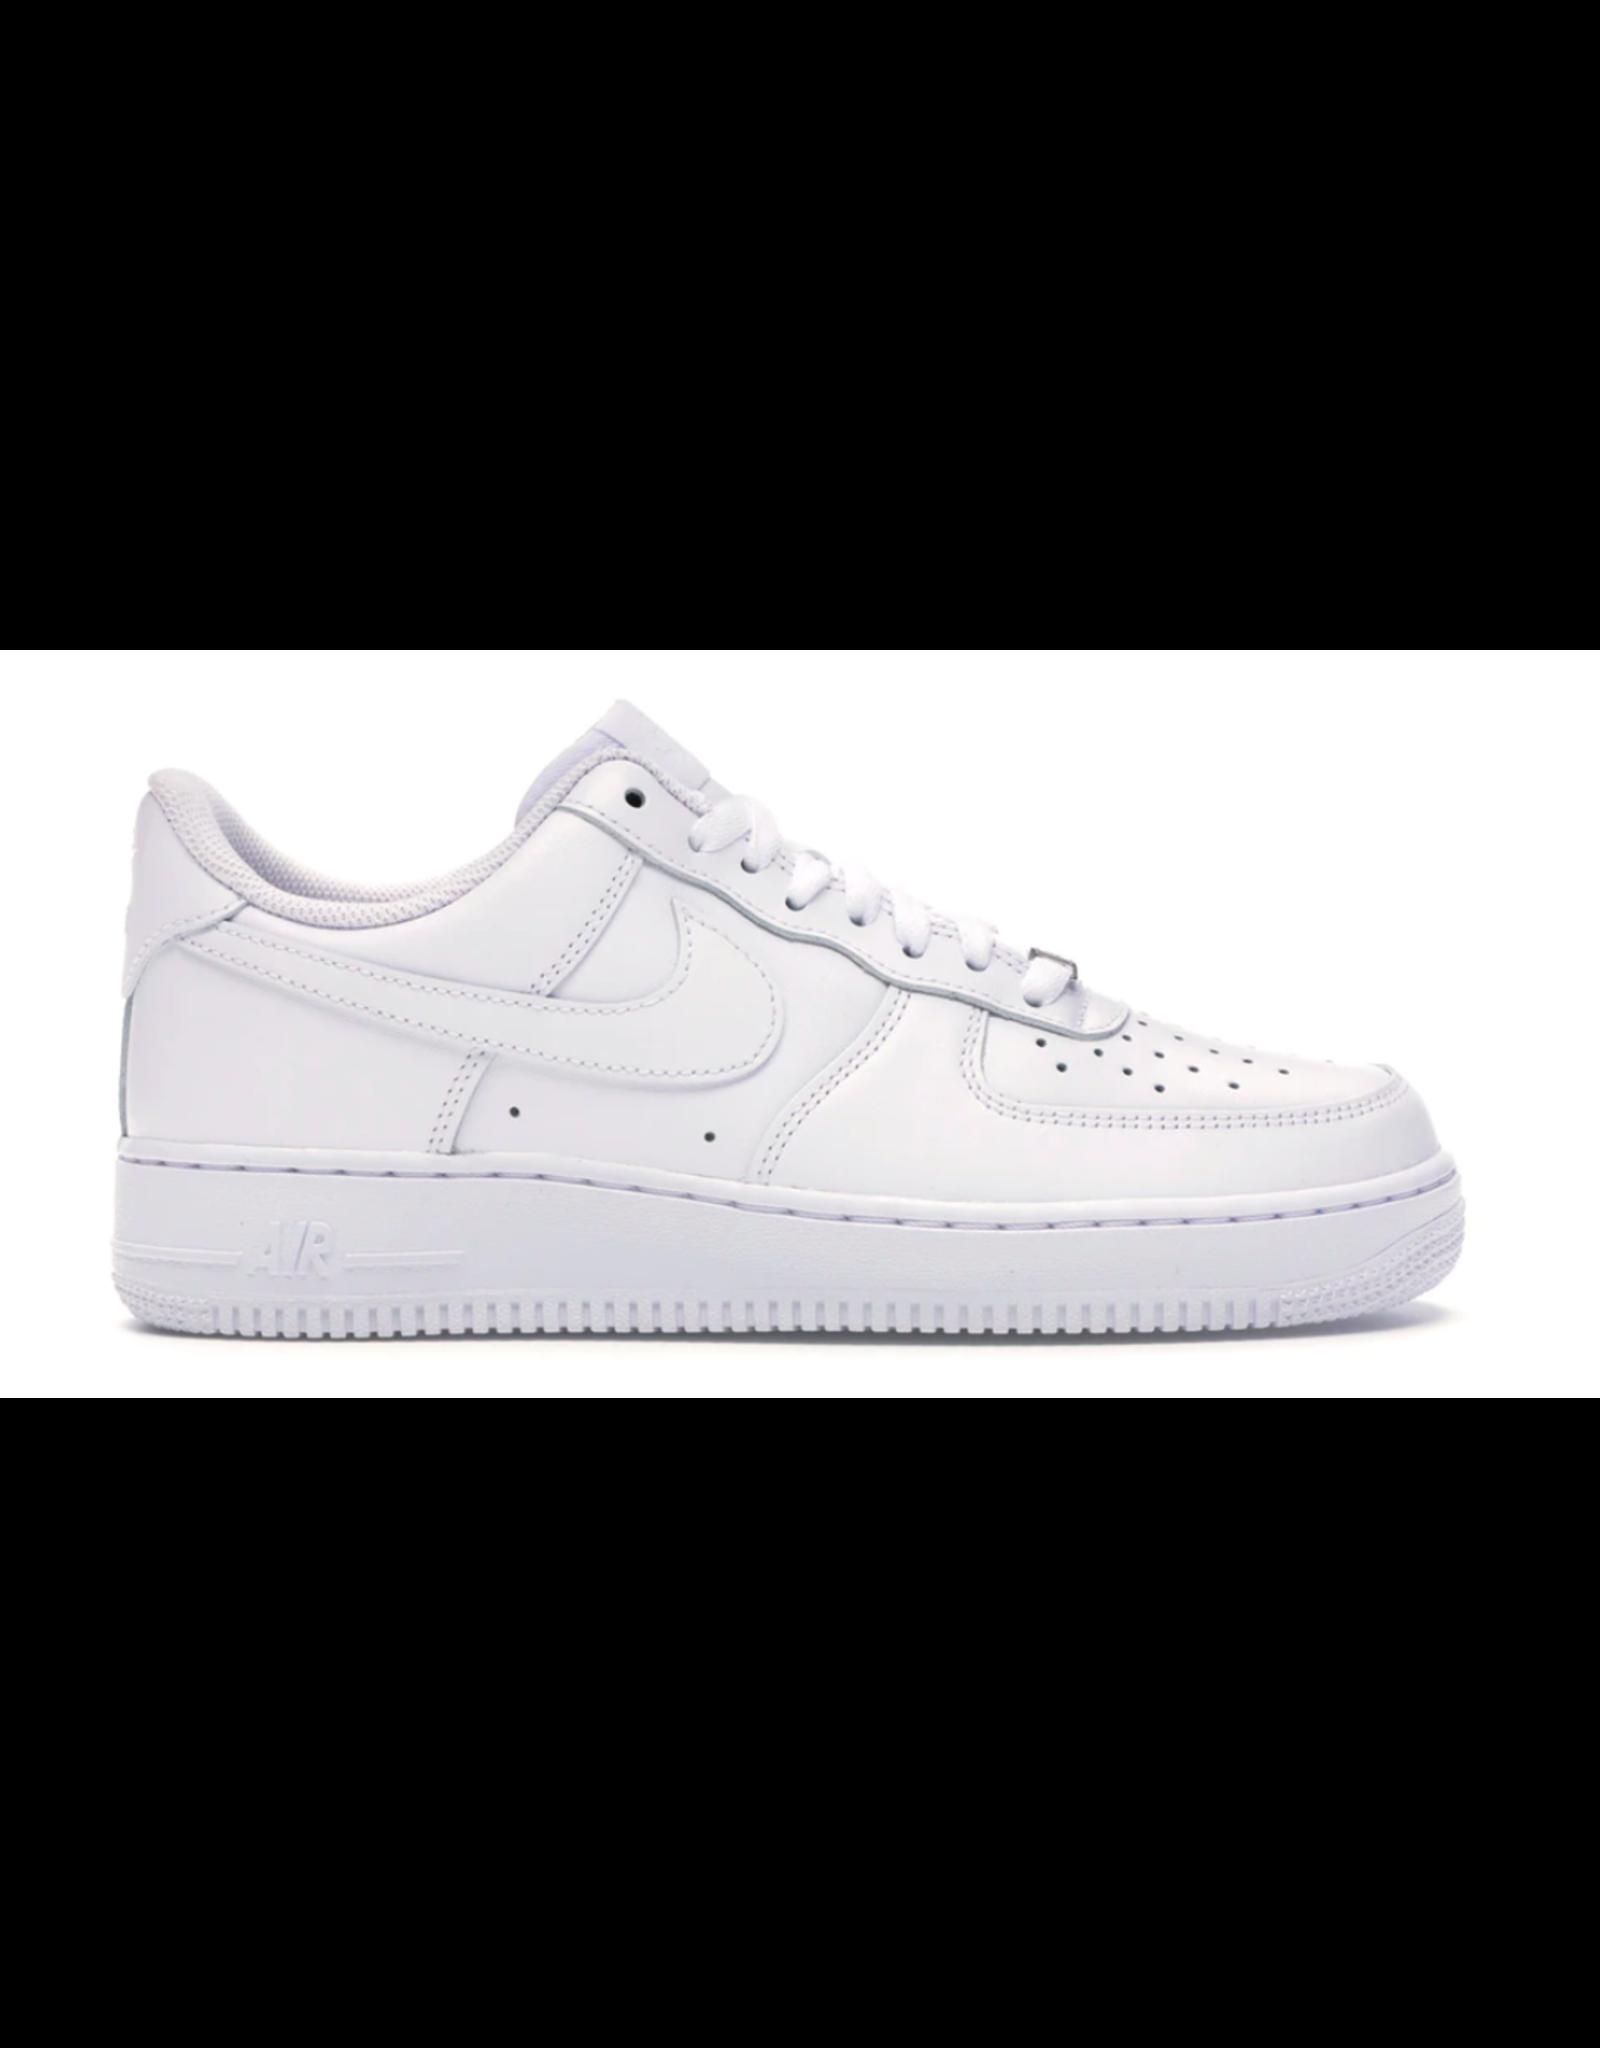 NIKE Nike Air Force 1 Low White '07